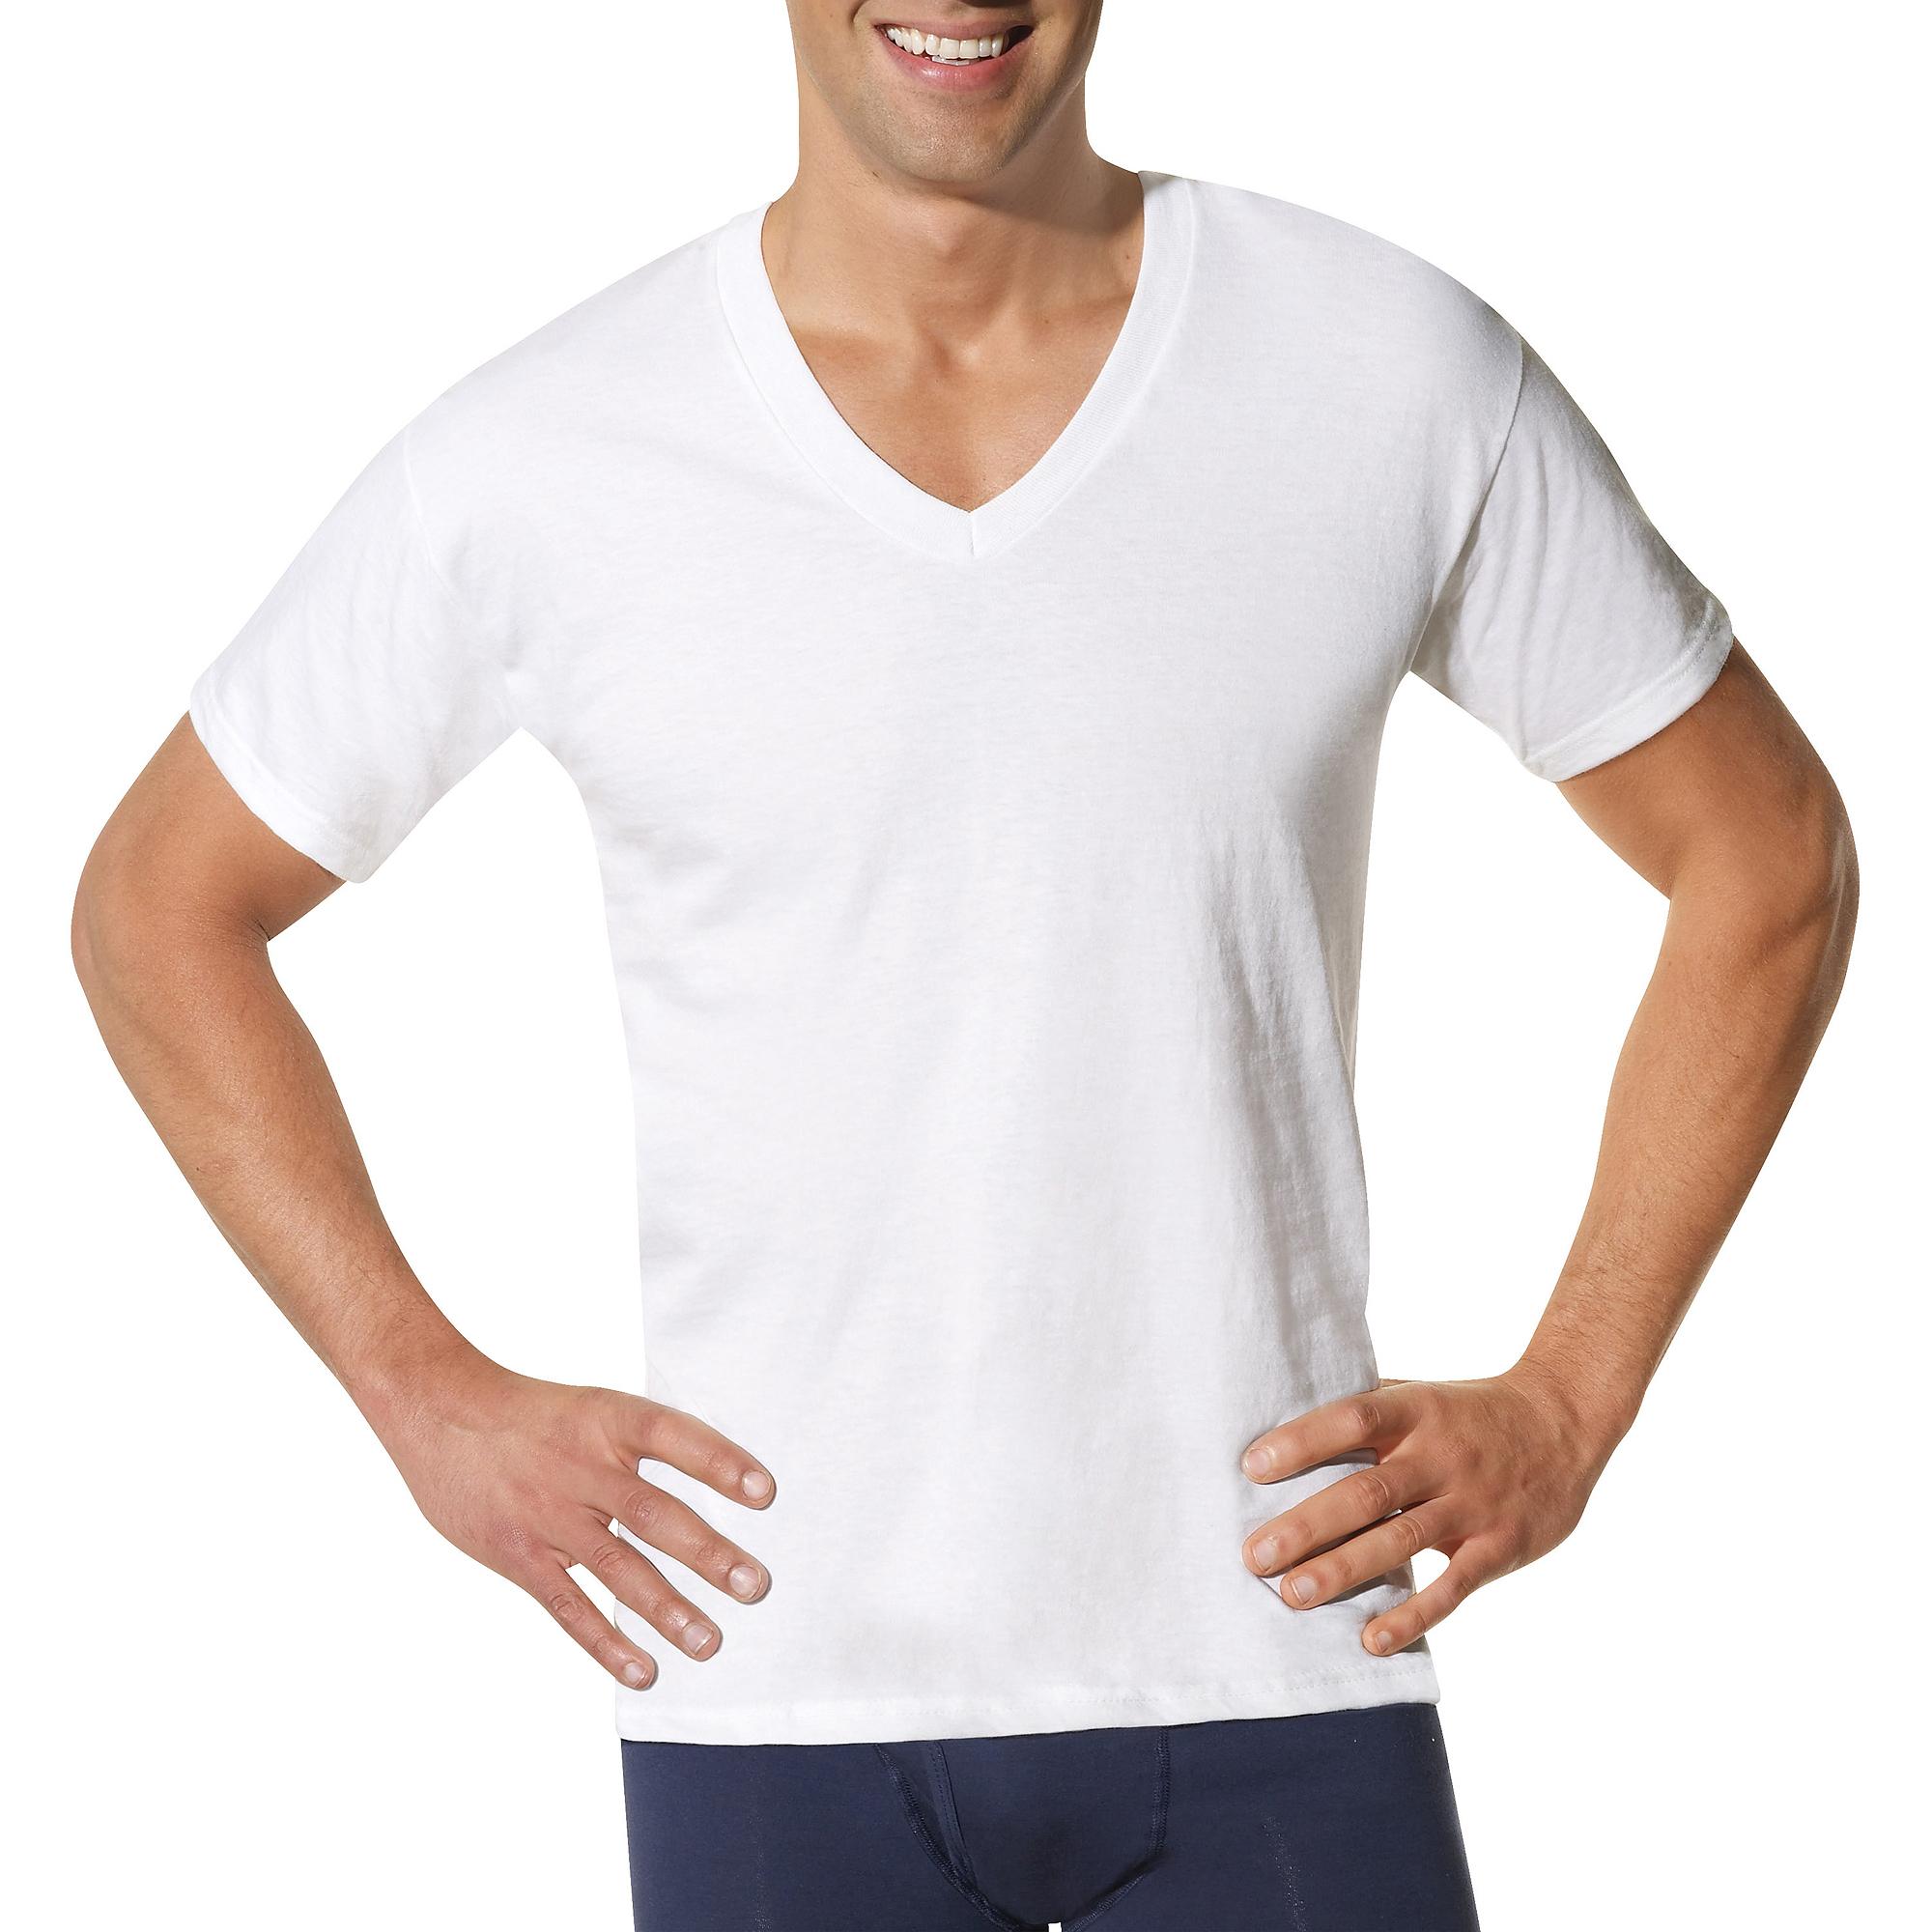 9 Pack Hanes Men 39 S Comfortsoft Tagless V Neck T Shirts